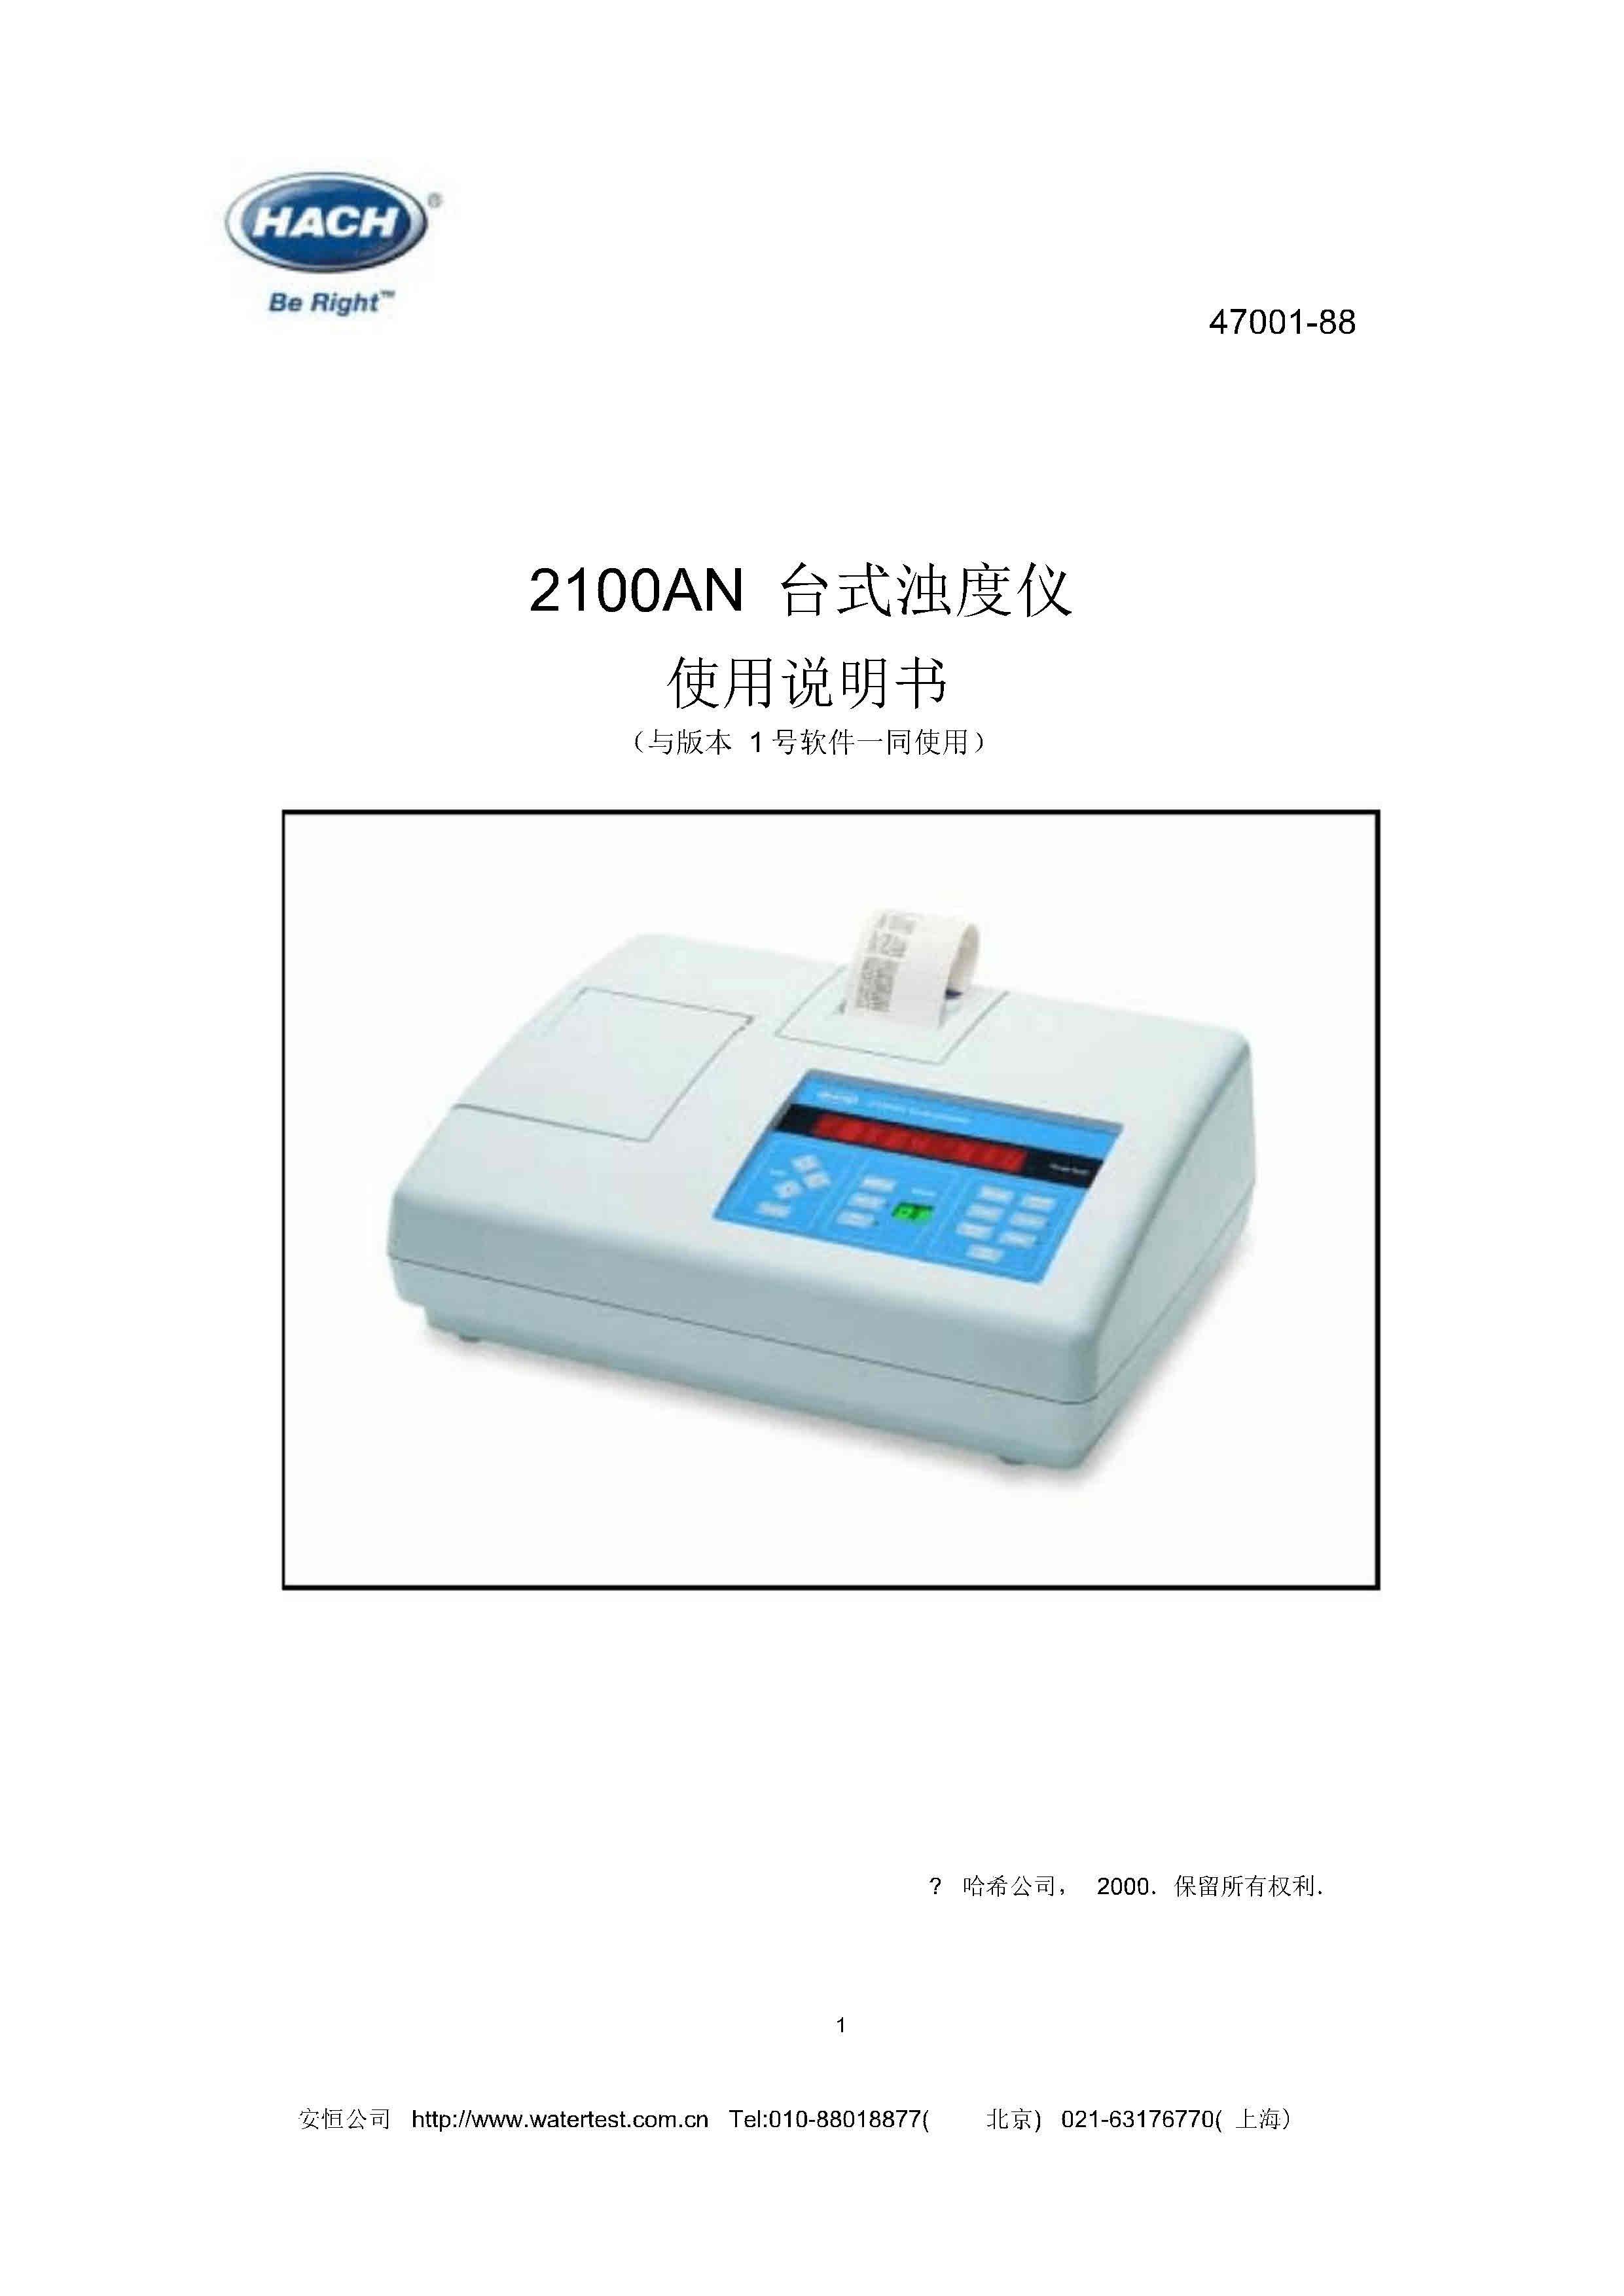 HACH哈希 2100AN台式浊度计使用说明书